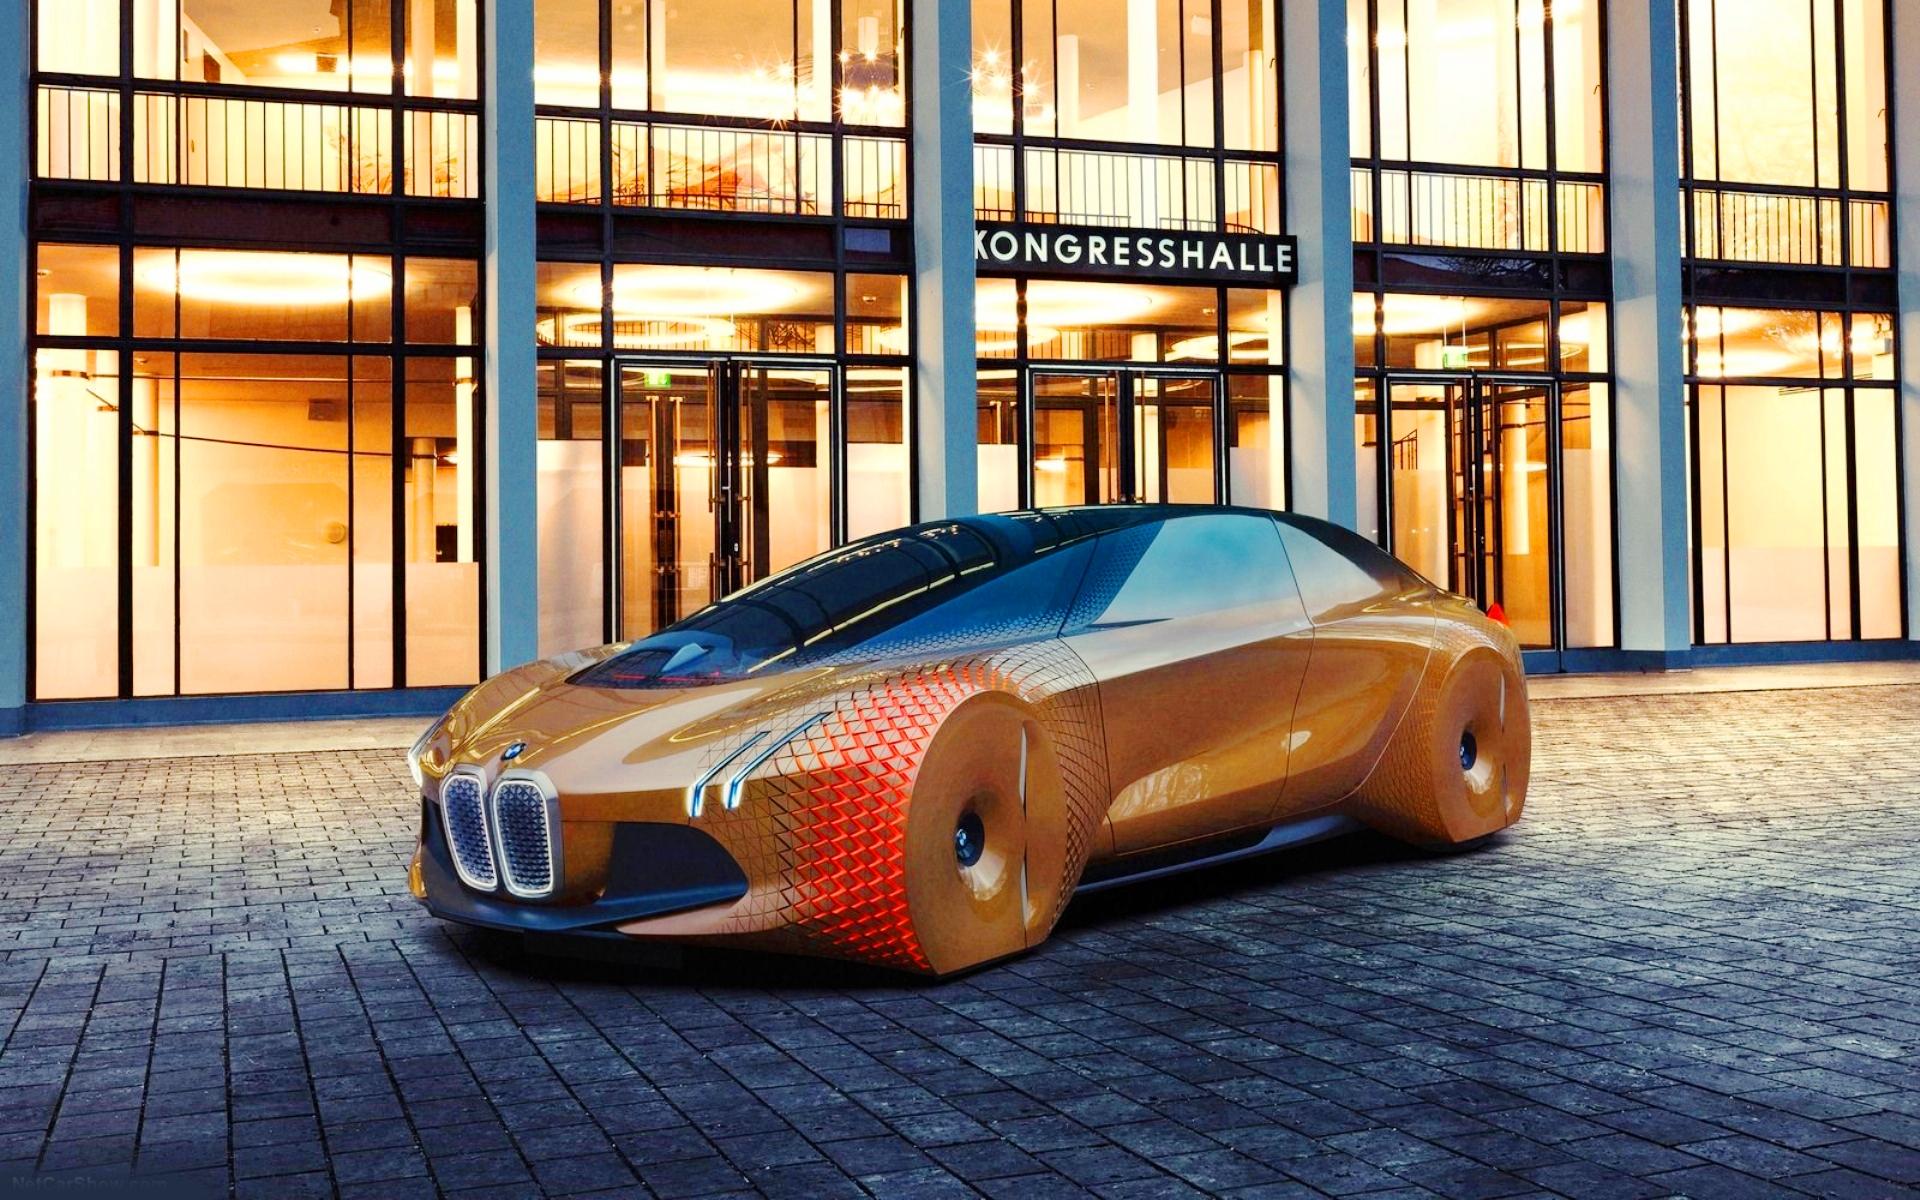 Картинка BMW Vision Next 100 » BMW   БМВ » Автомобили ...